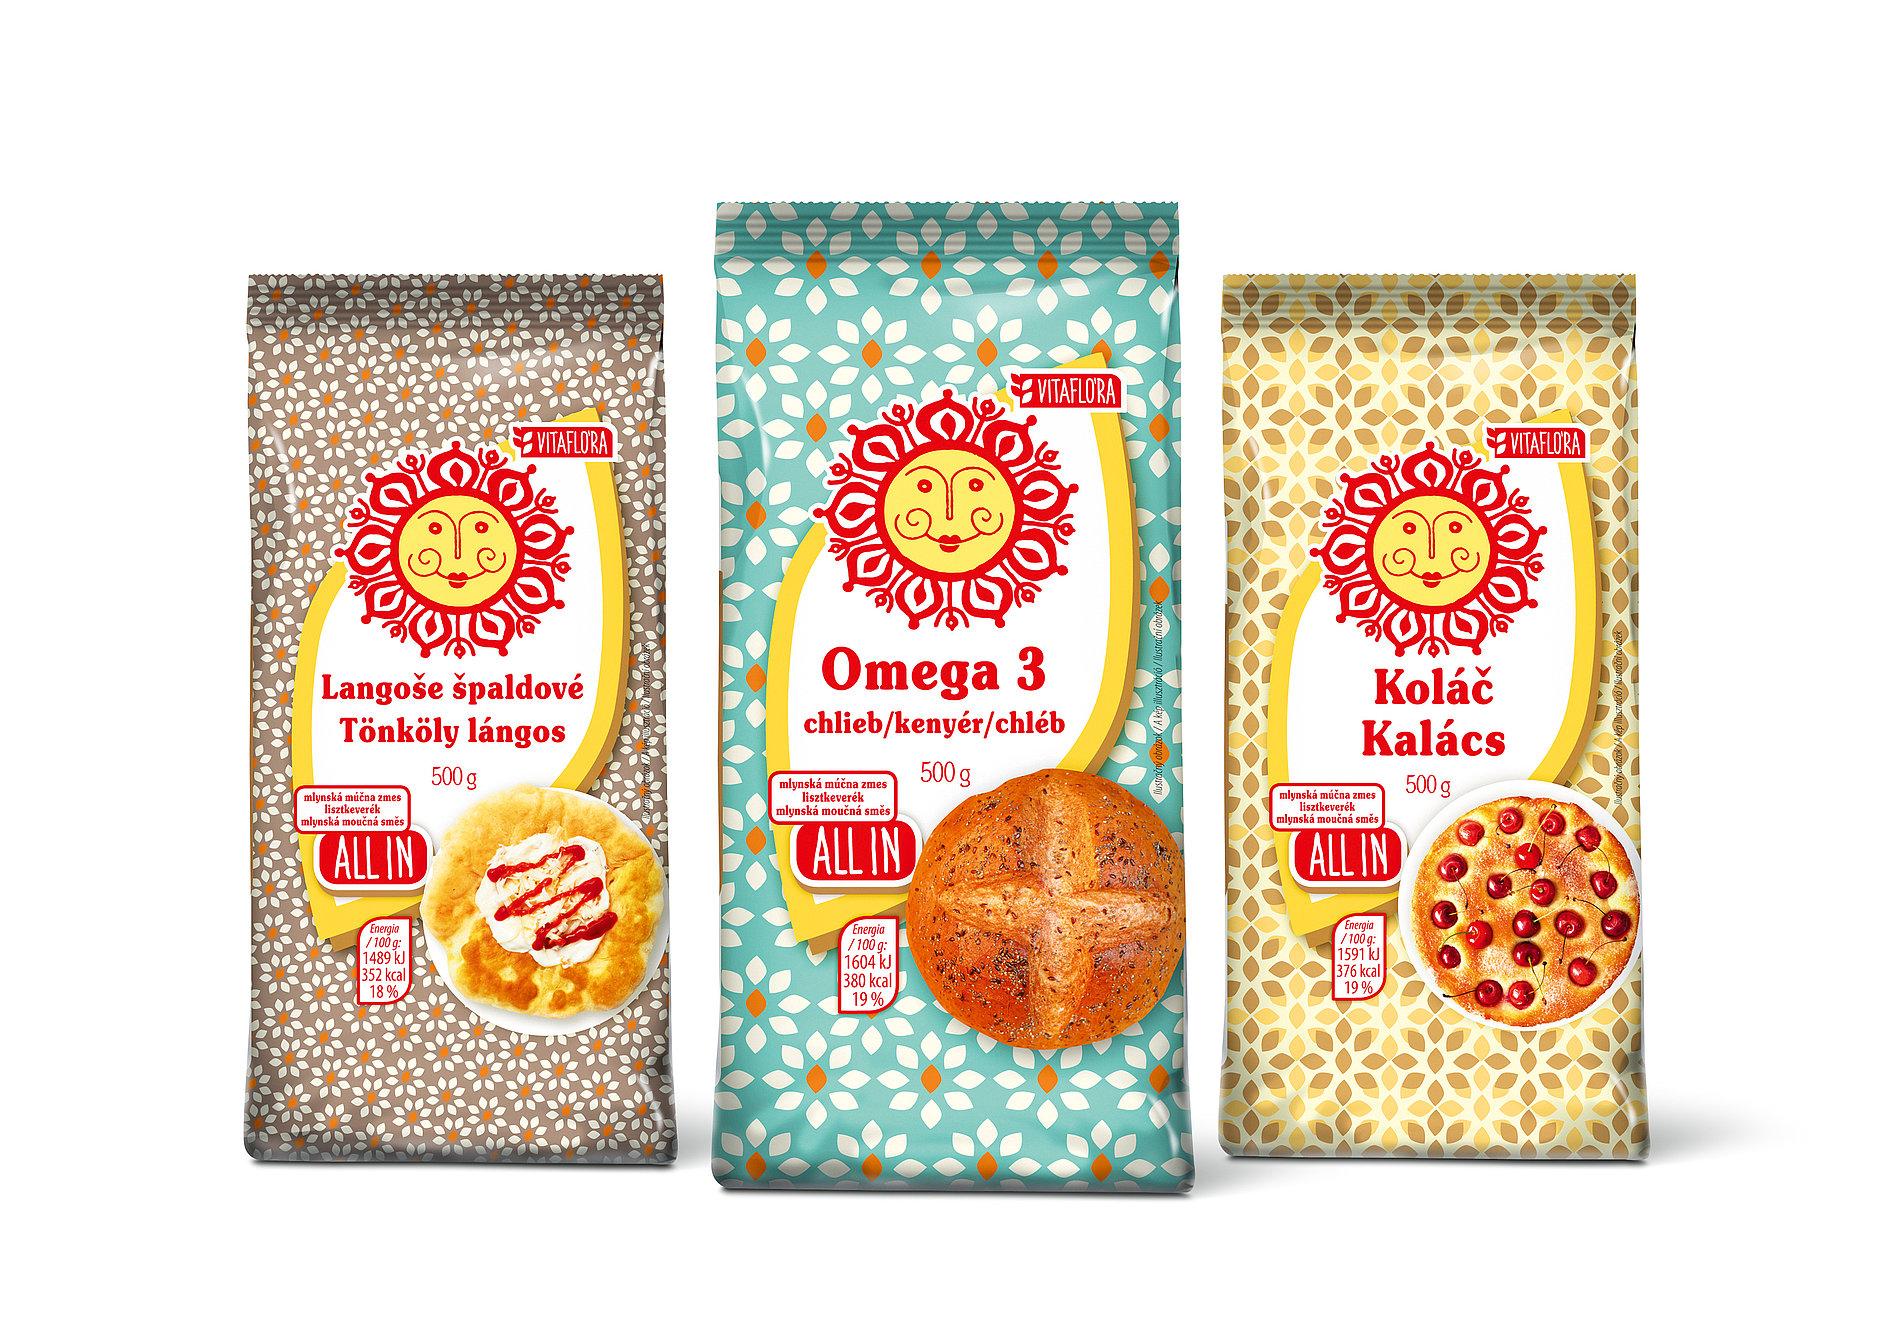 Sun Vitaflora Flour | Red Dot Design Award